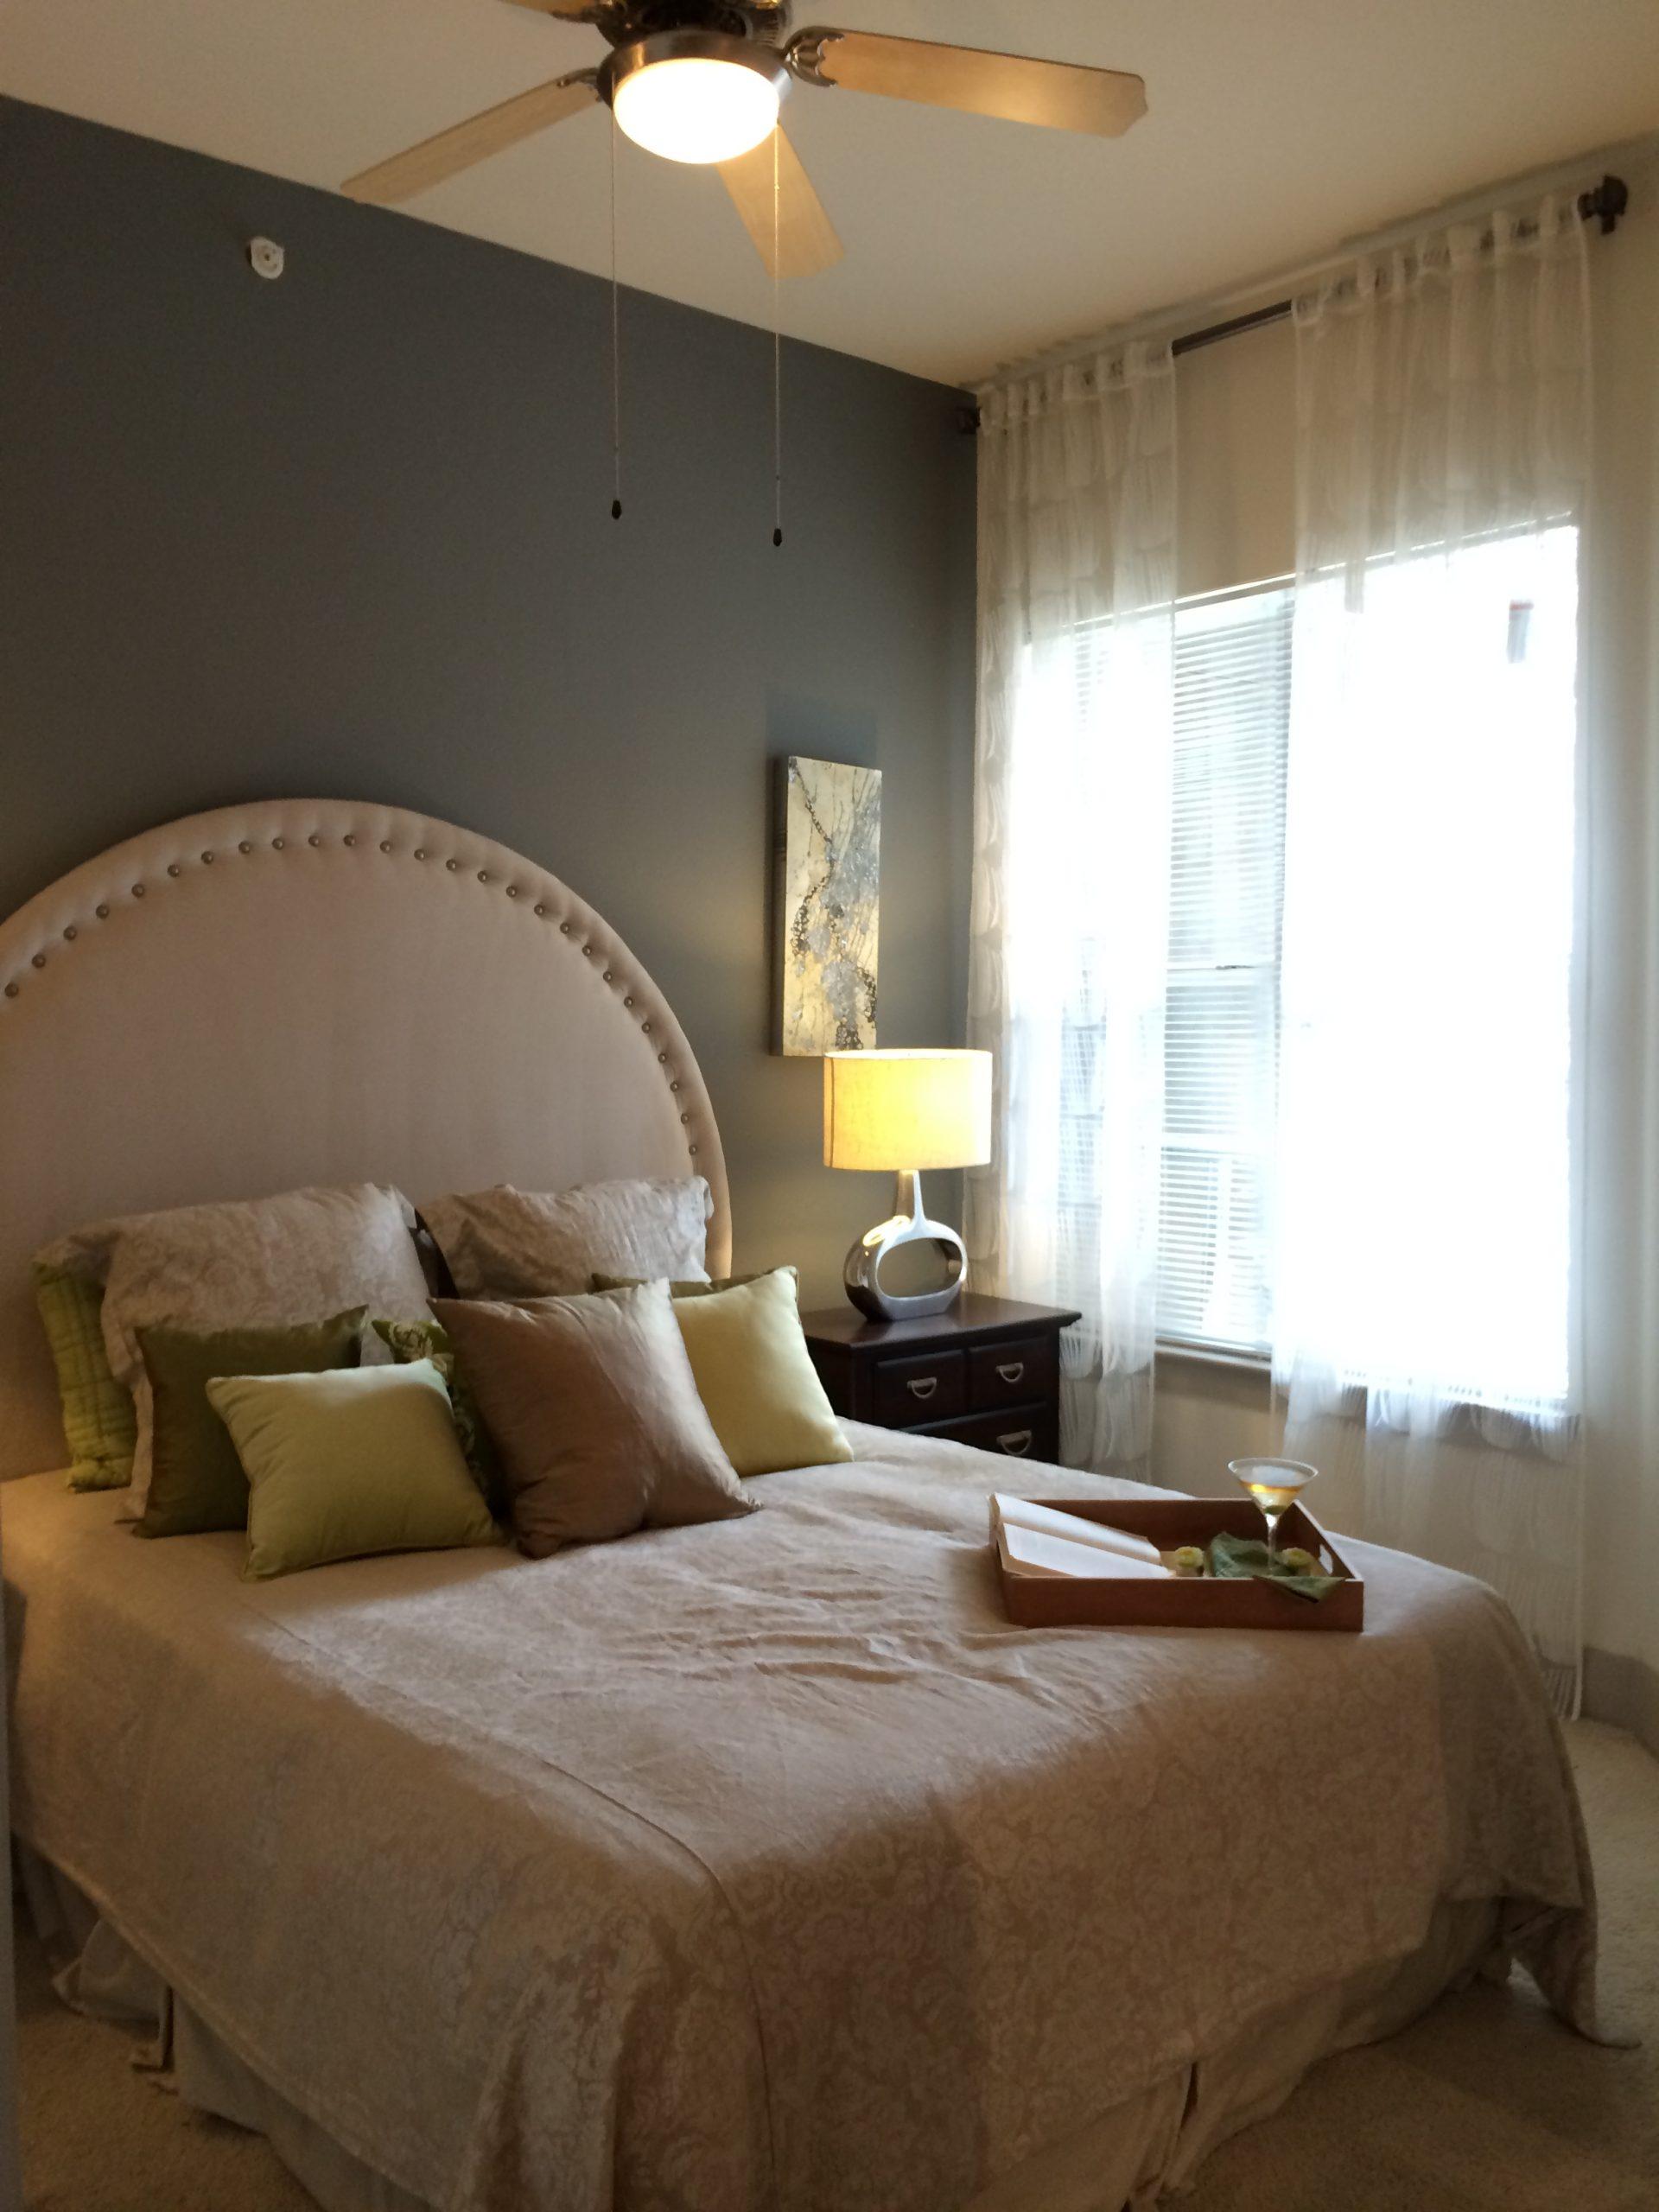 2929 Wycliff Apartments in Dallas, TX | LUX Locators ...